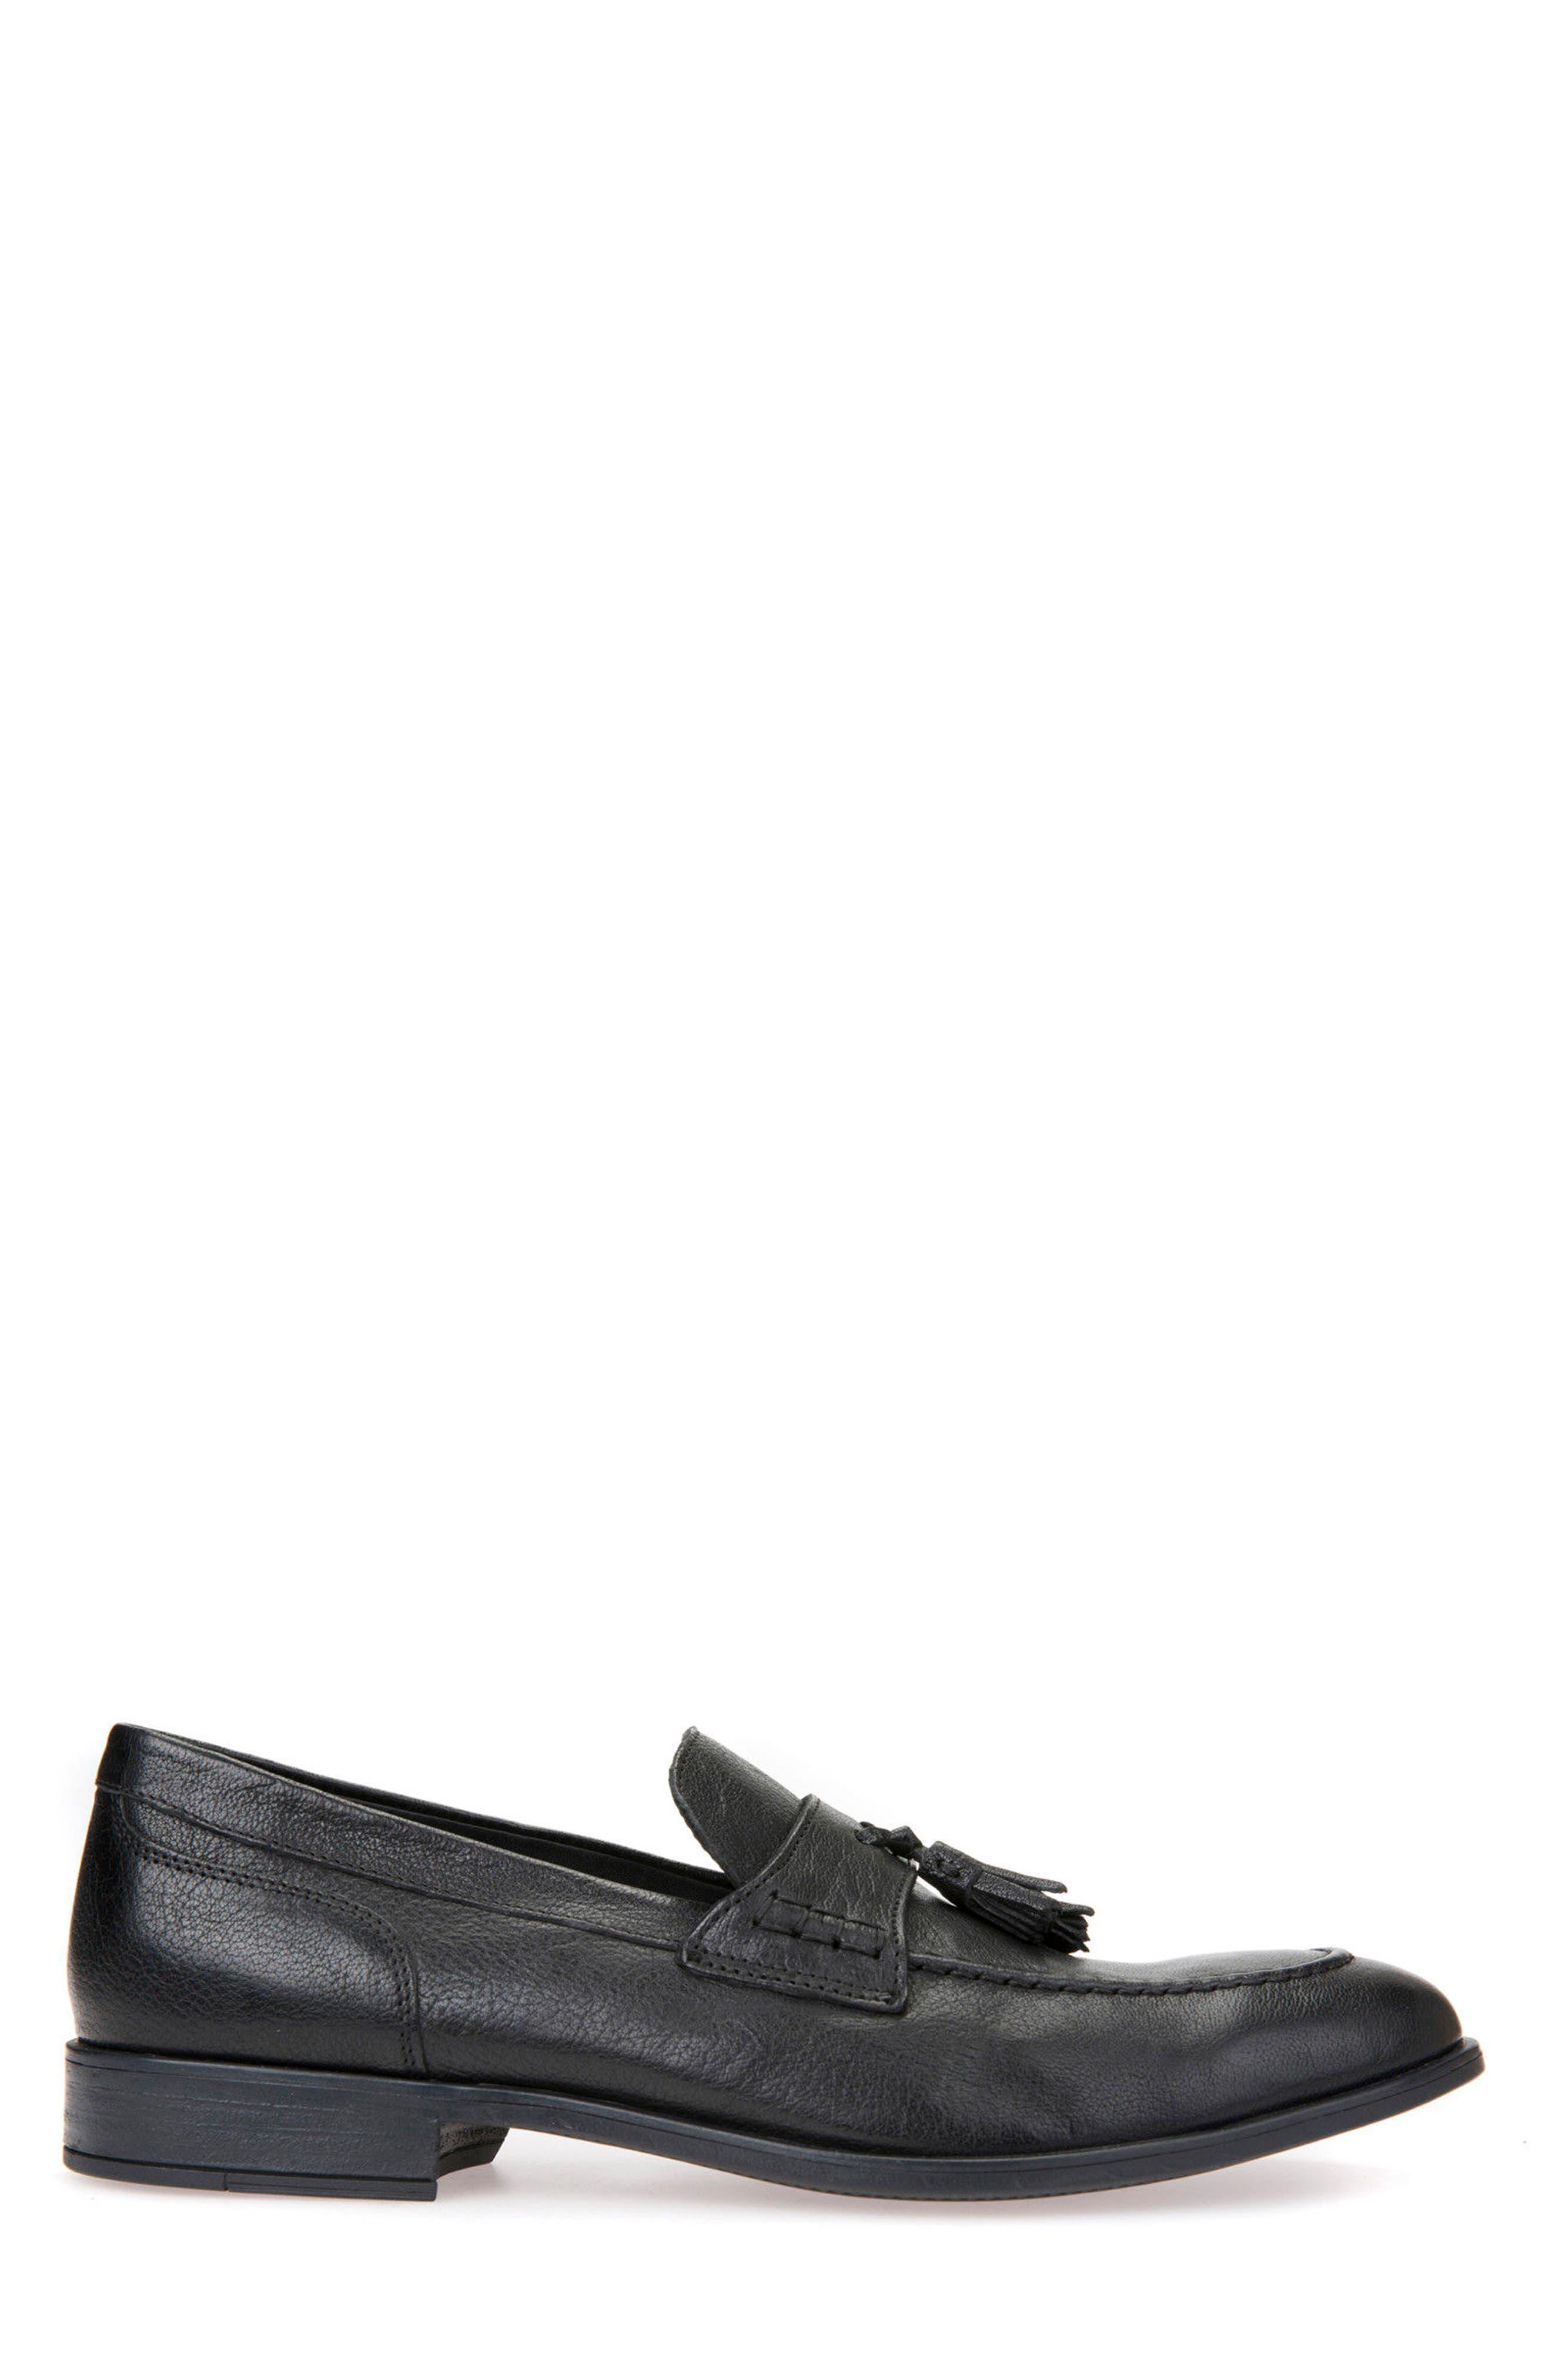 Bryceton 4 Tassel Loafer,                             Alternate thumbnail 3, color,                             BLACK LEATHER